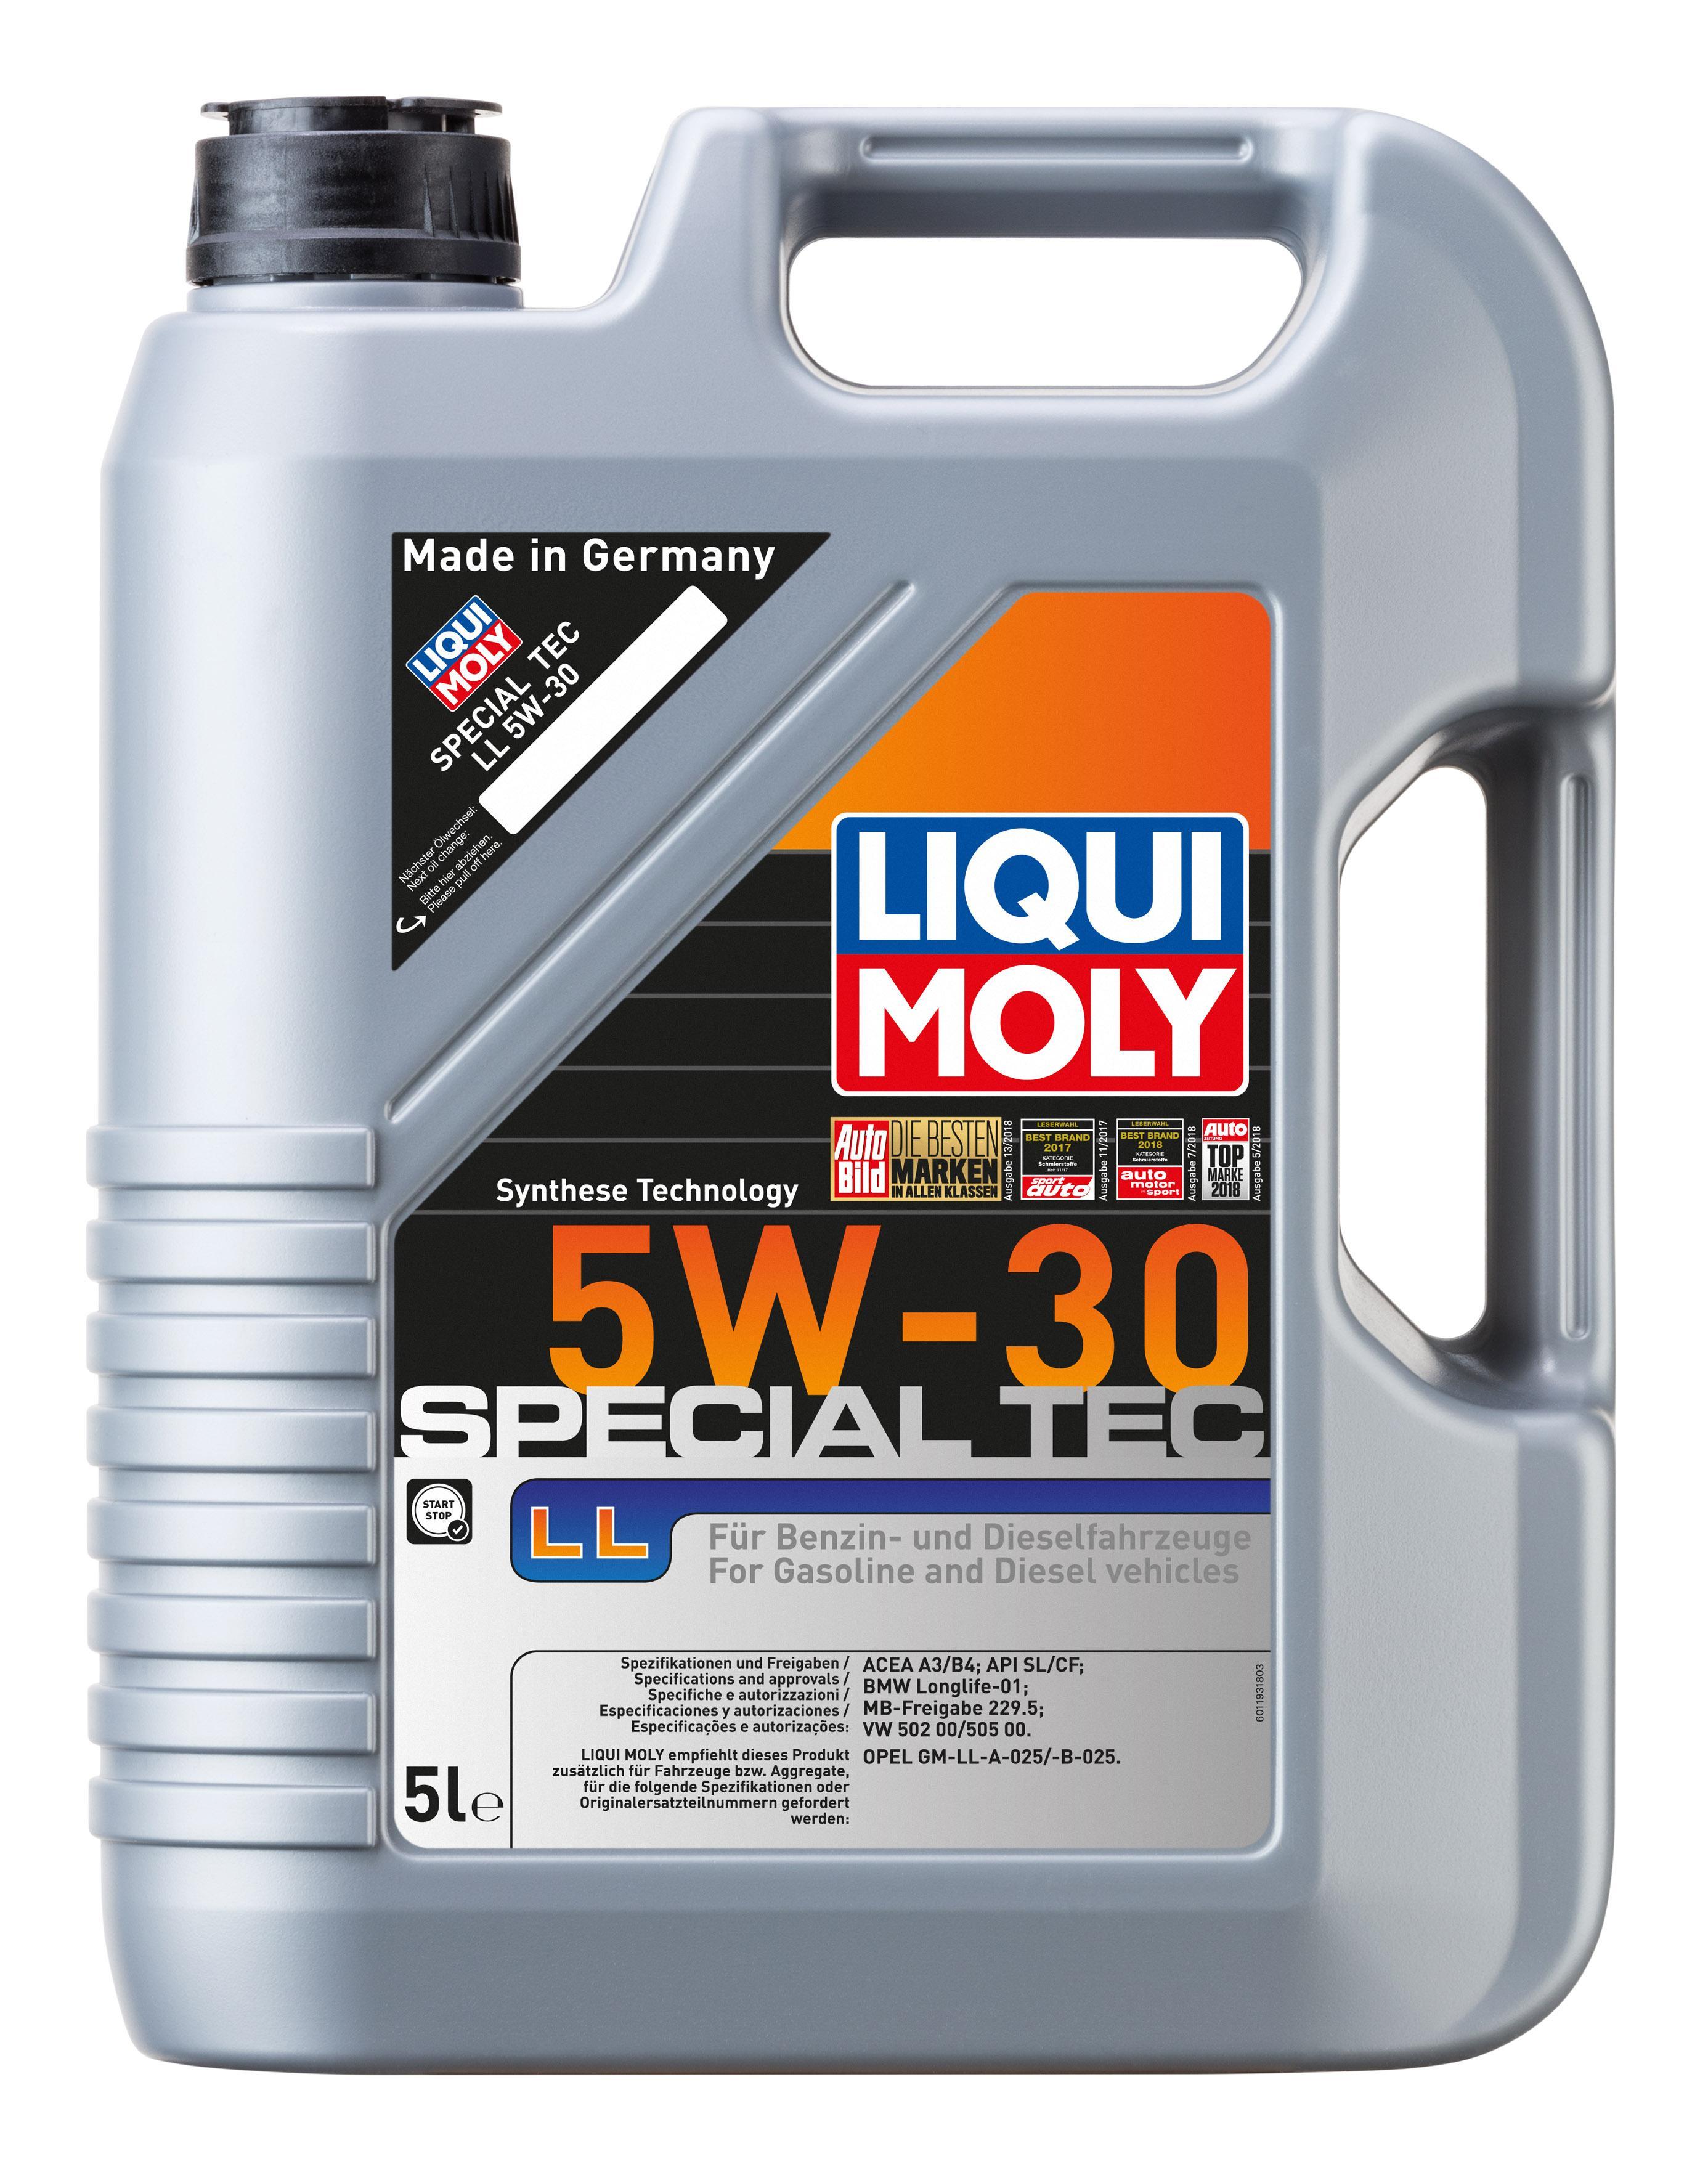 Motoröl LIQUI MOLY OpelGMLLA025 Erfahrung